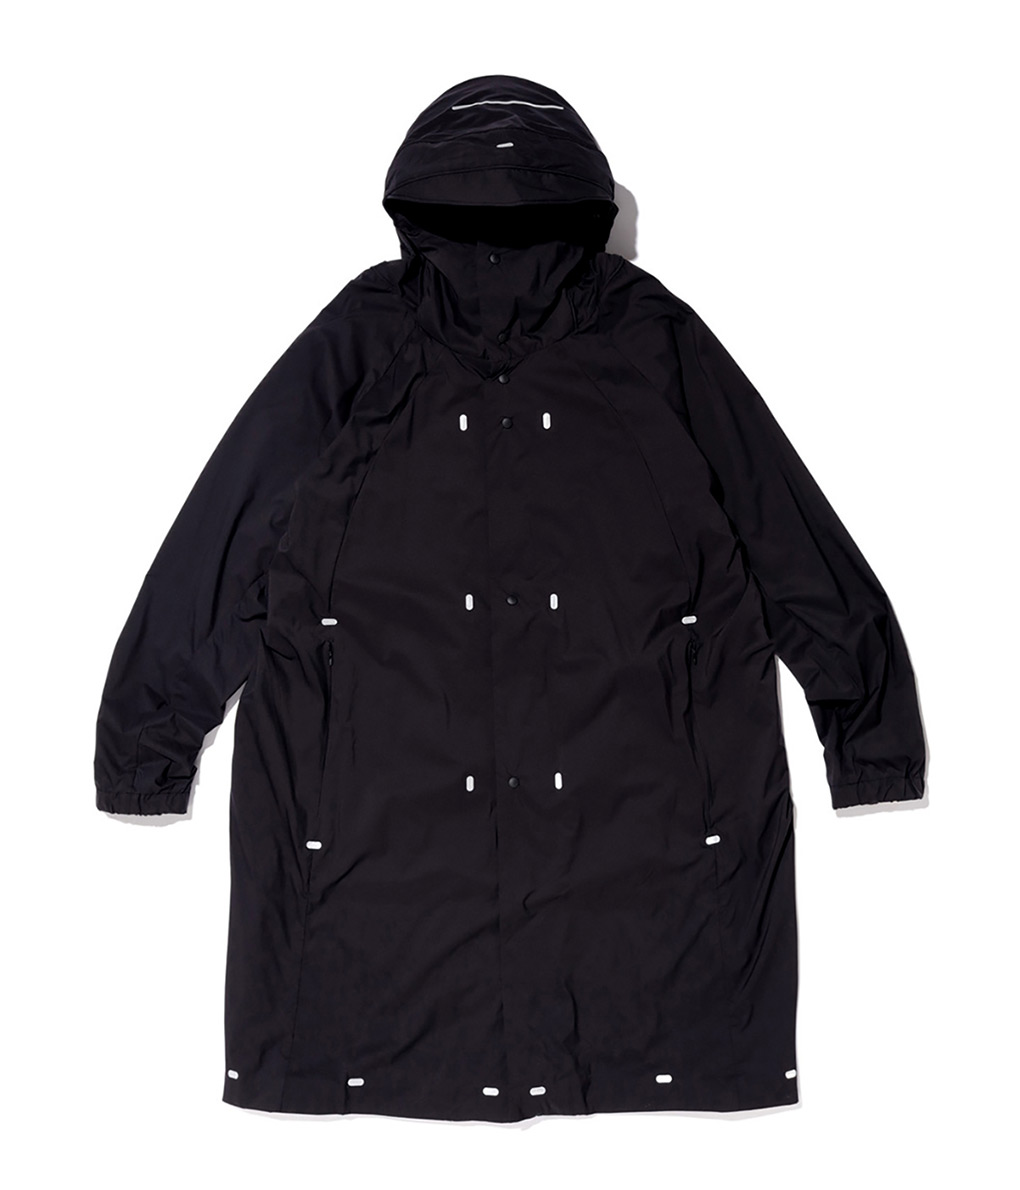 alk phenix / アルクフェニックス : dome coat/EPIC : ドーム コート アルクフェニックス : PO912WT01-re 【REA】